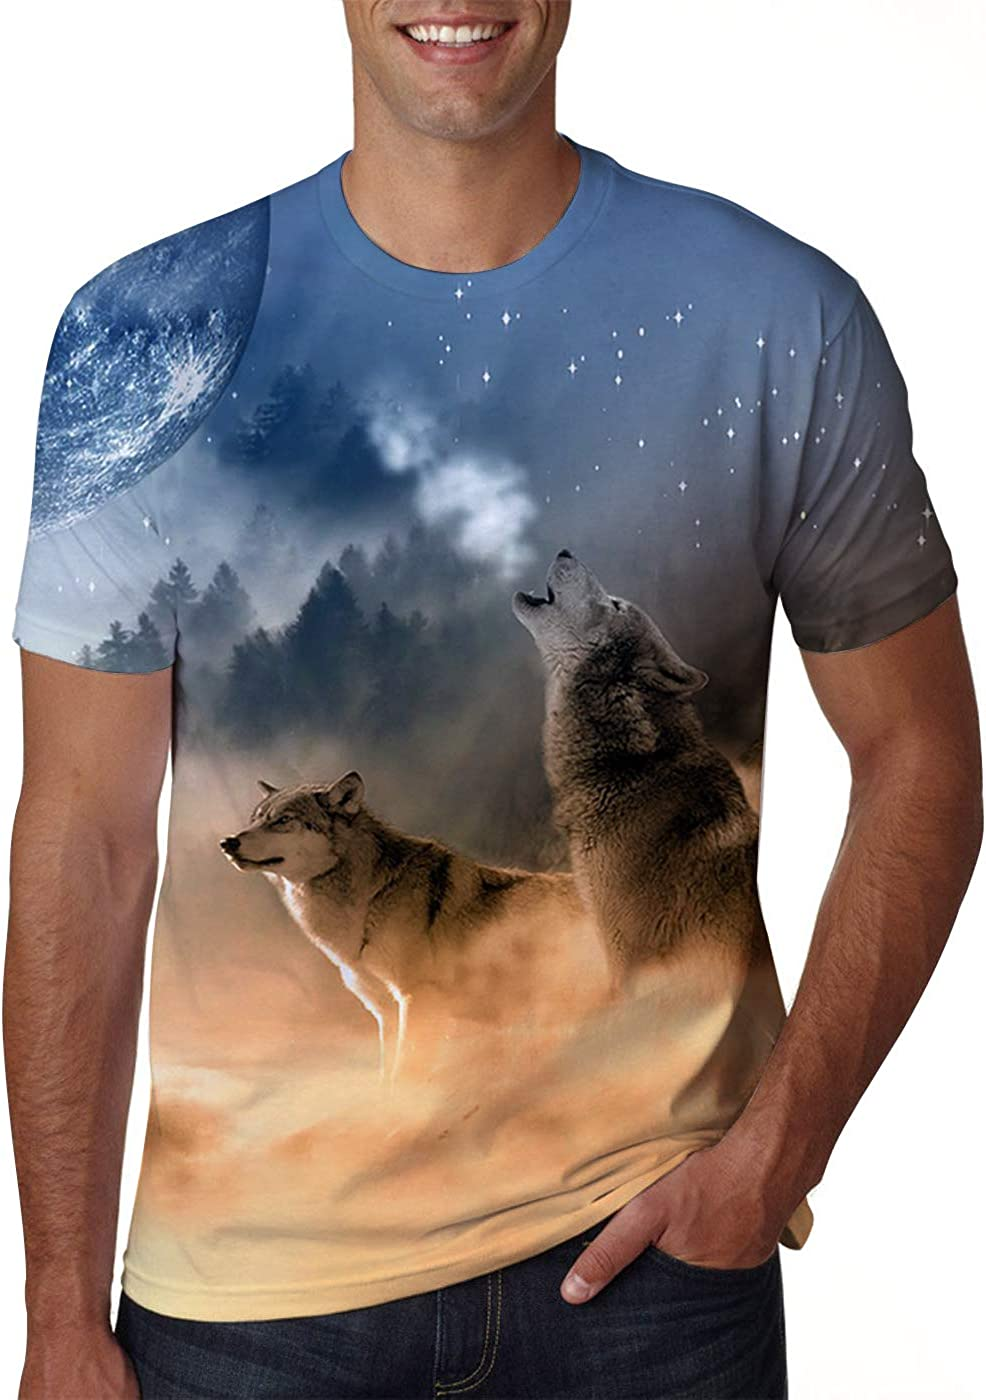 Idgreatim Unisex informale 3D Stampa Animalier Manica Corta T-Shirt Tees Graphic